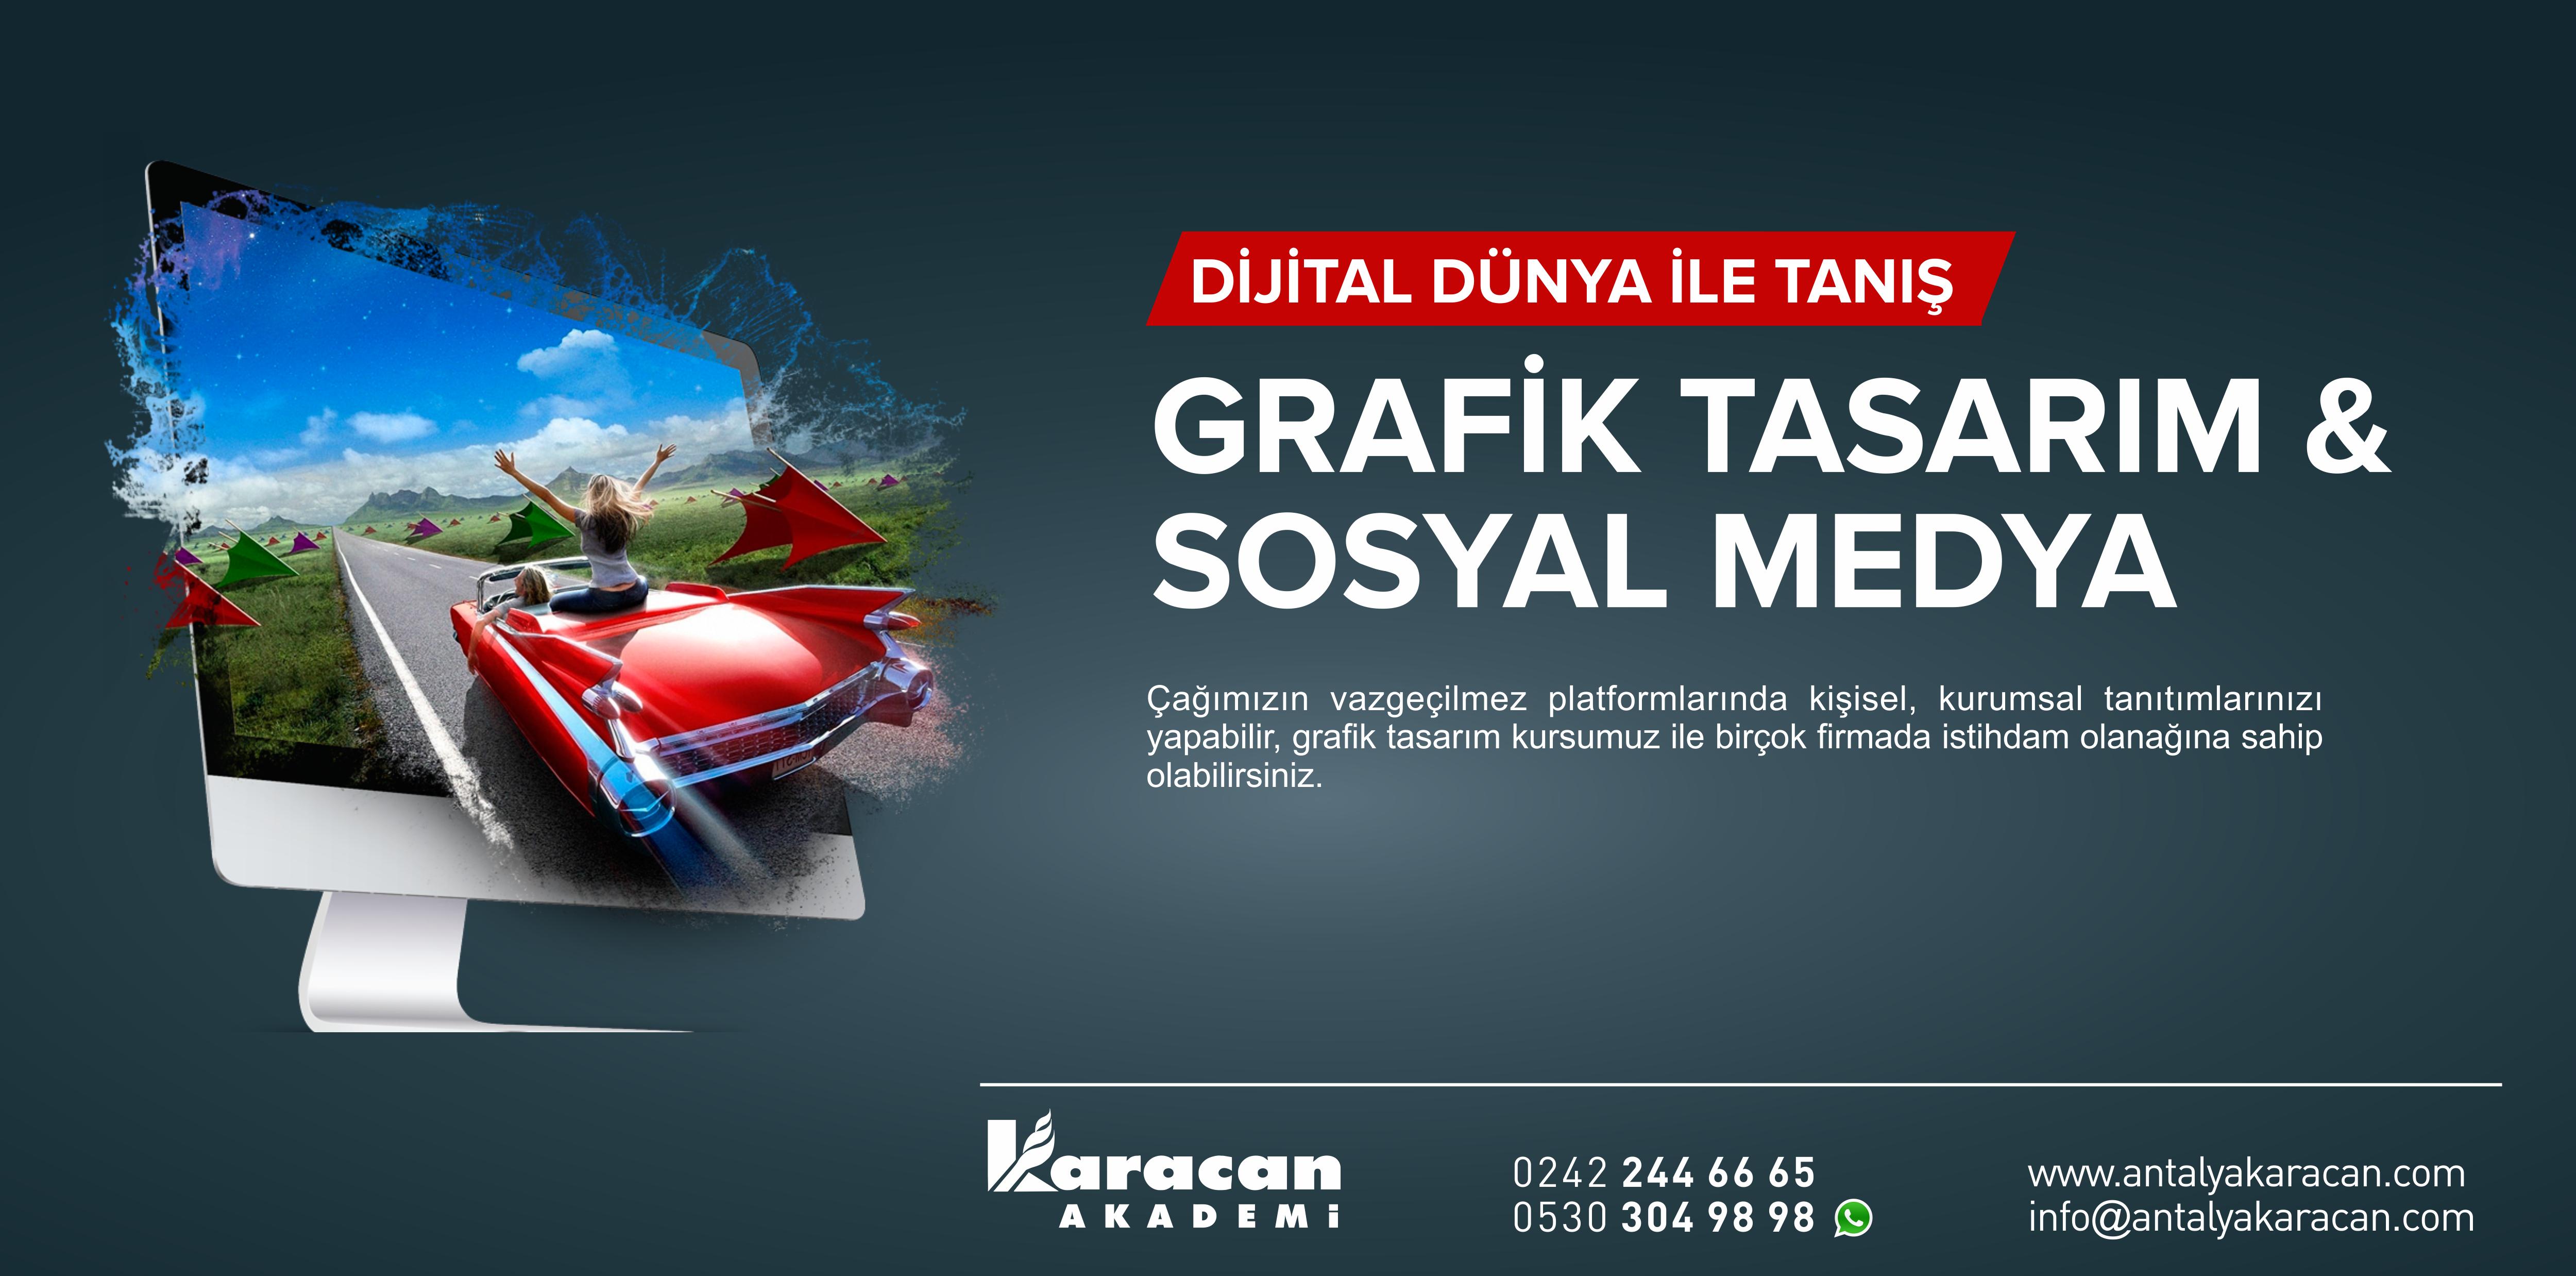 Antalya M.E.B. Onaylı Grafik Tasarım Kursu